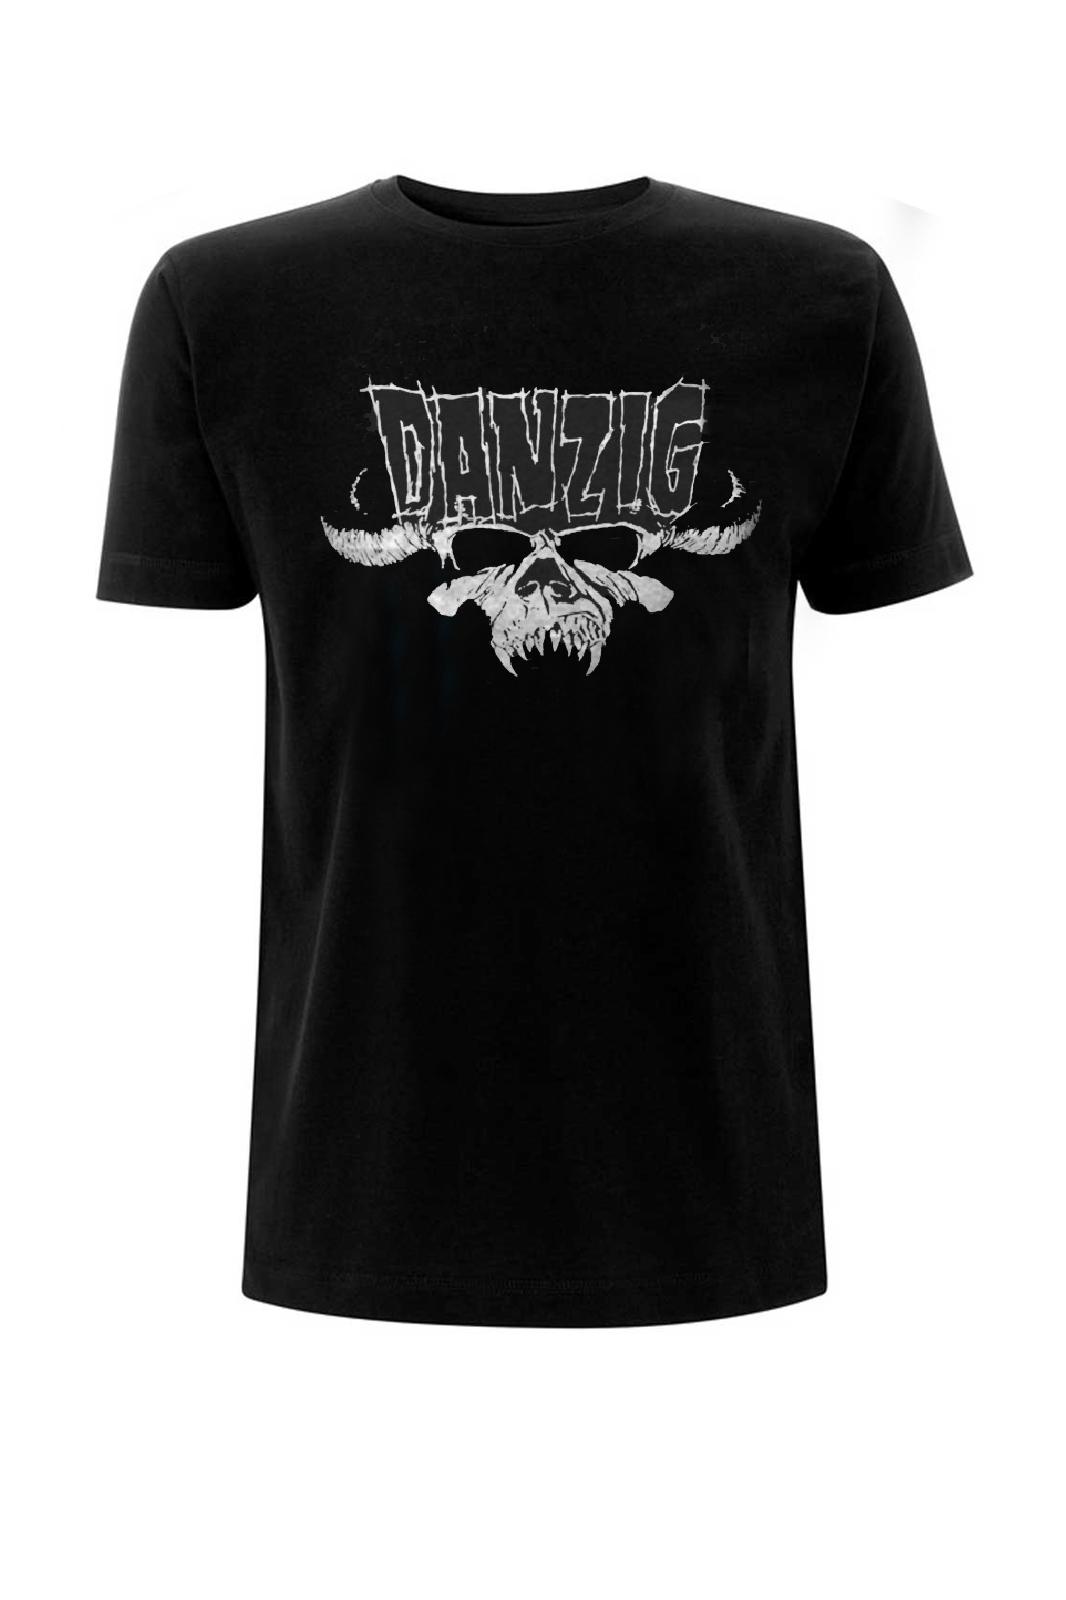 Tee Danzig Classic Logo Black